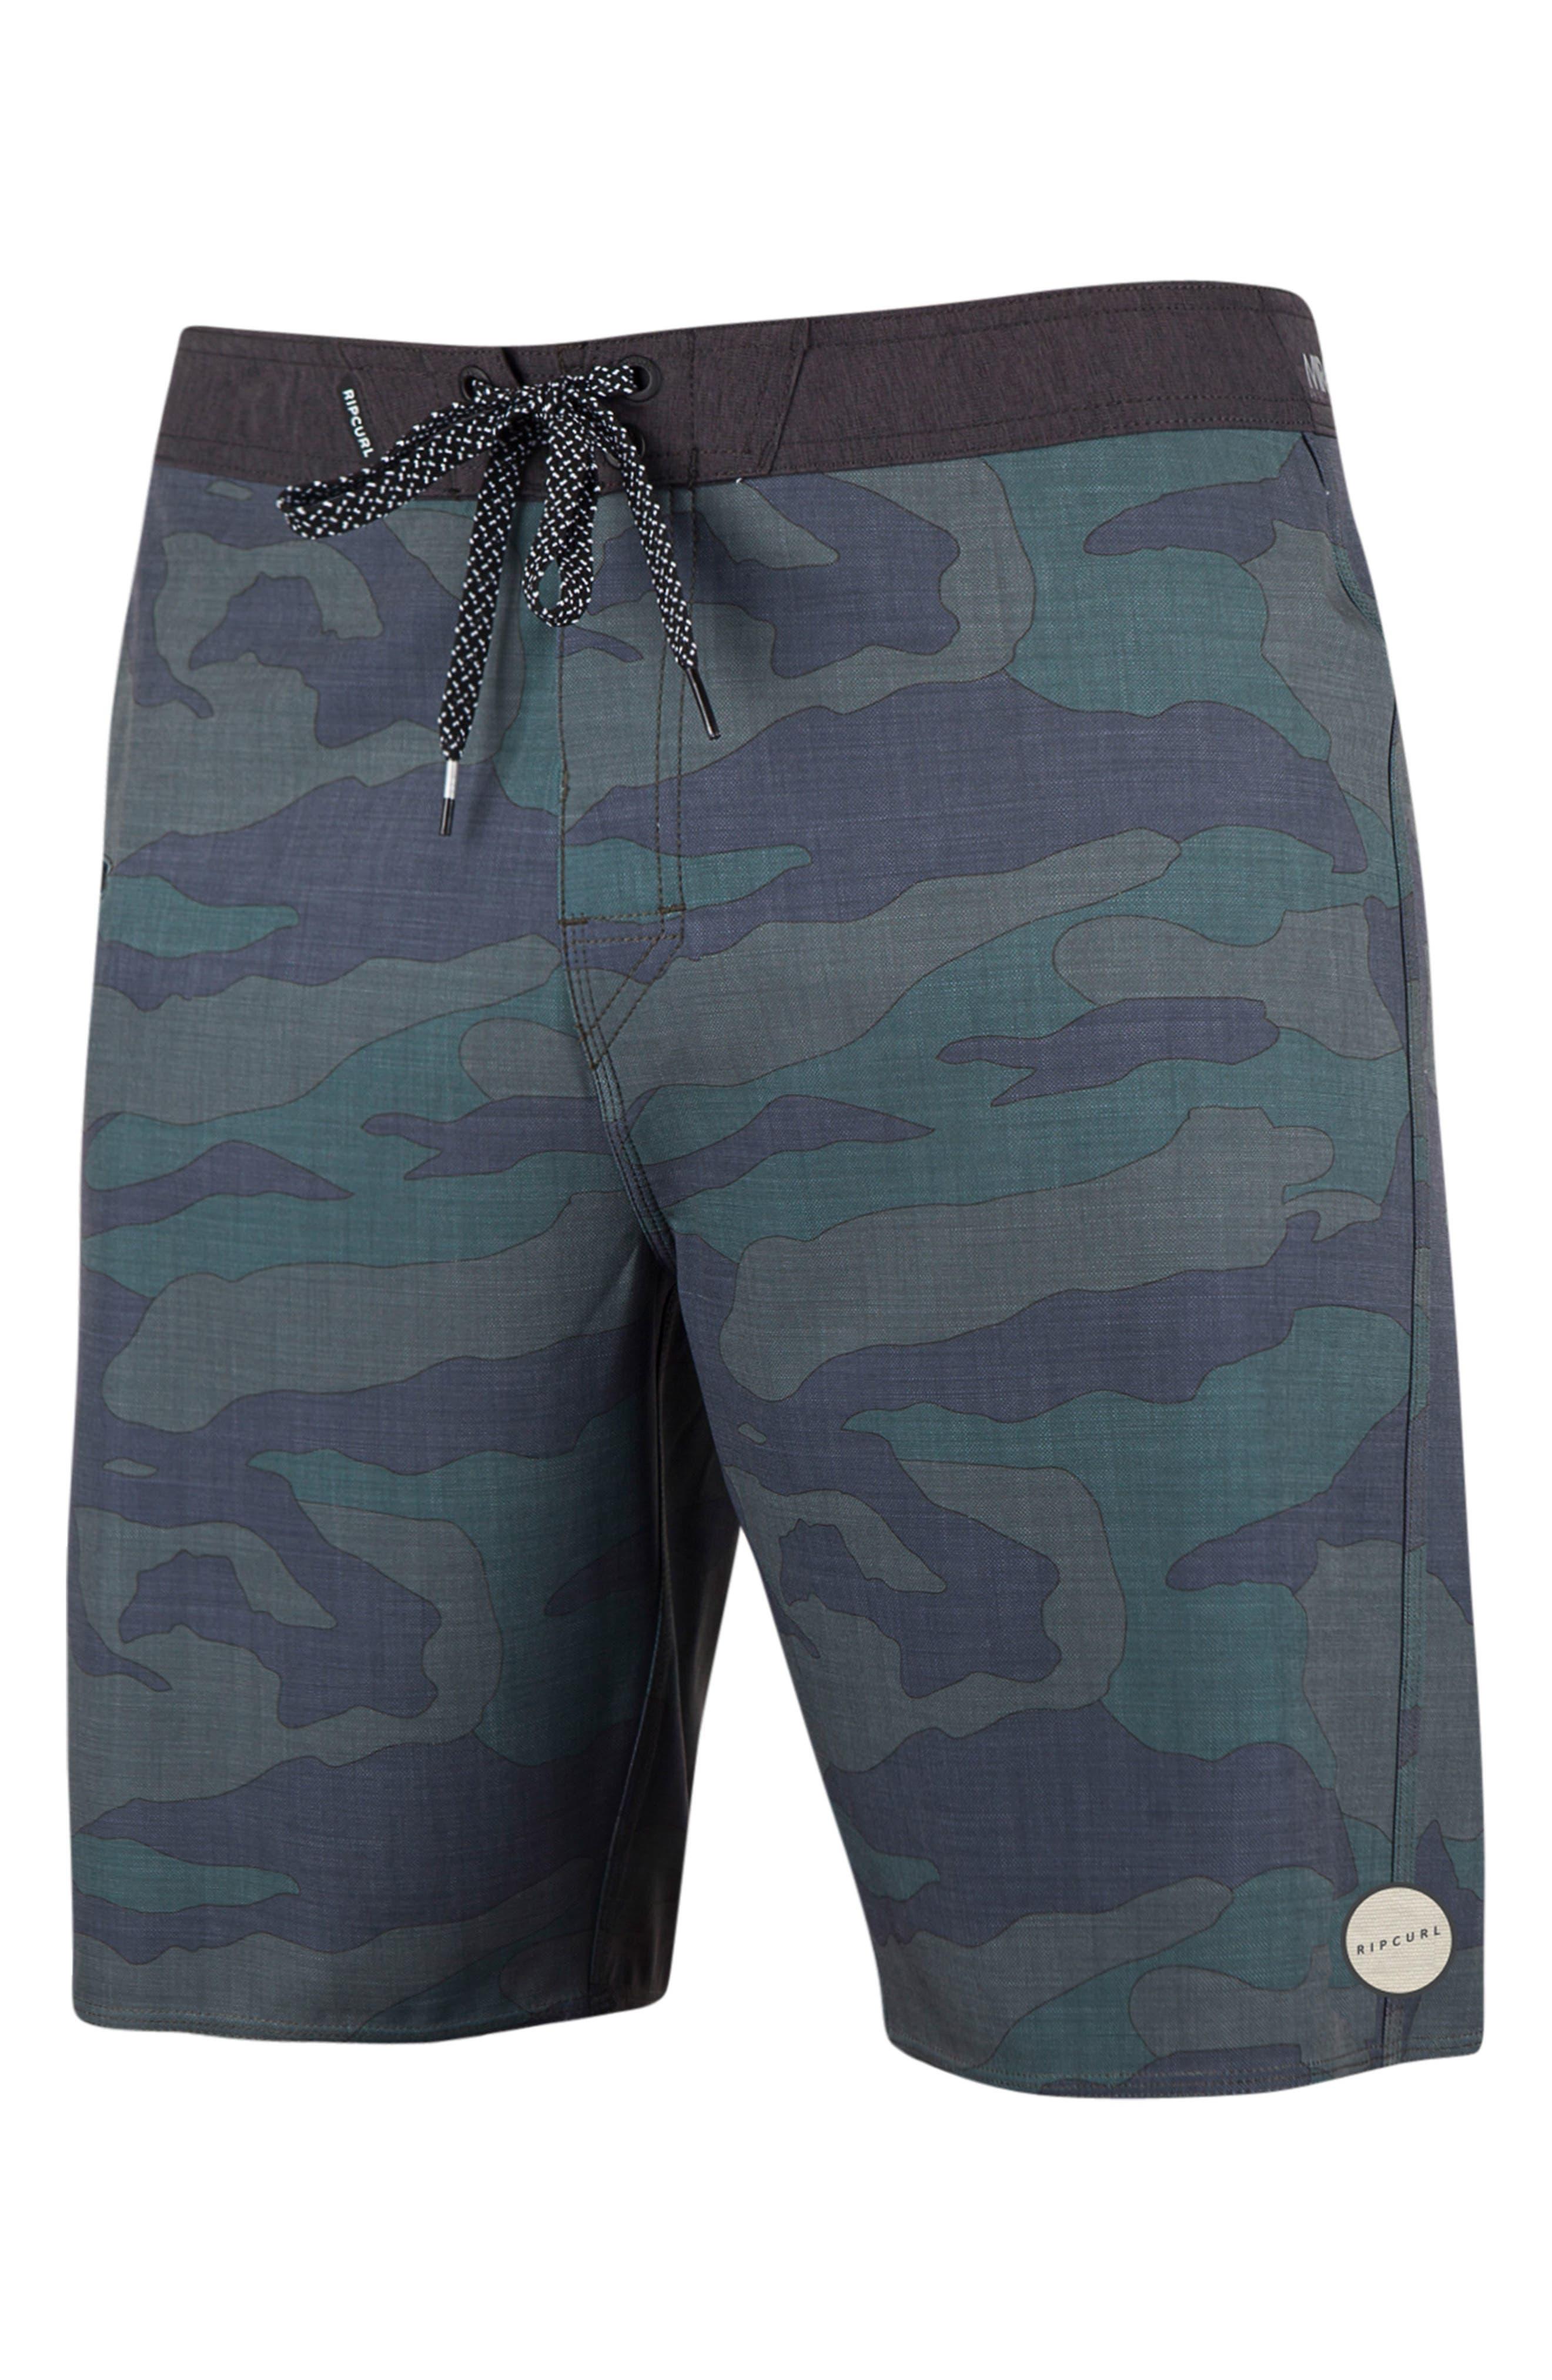 Mirage Backyard Board Shorts,                             Main thumbnail 1, color,                             Camo